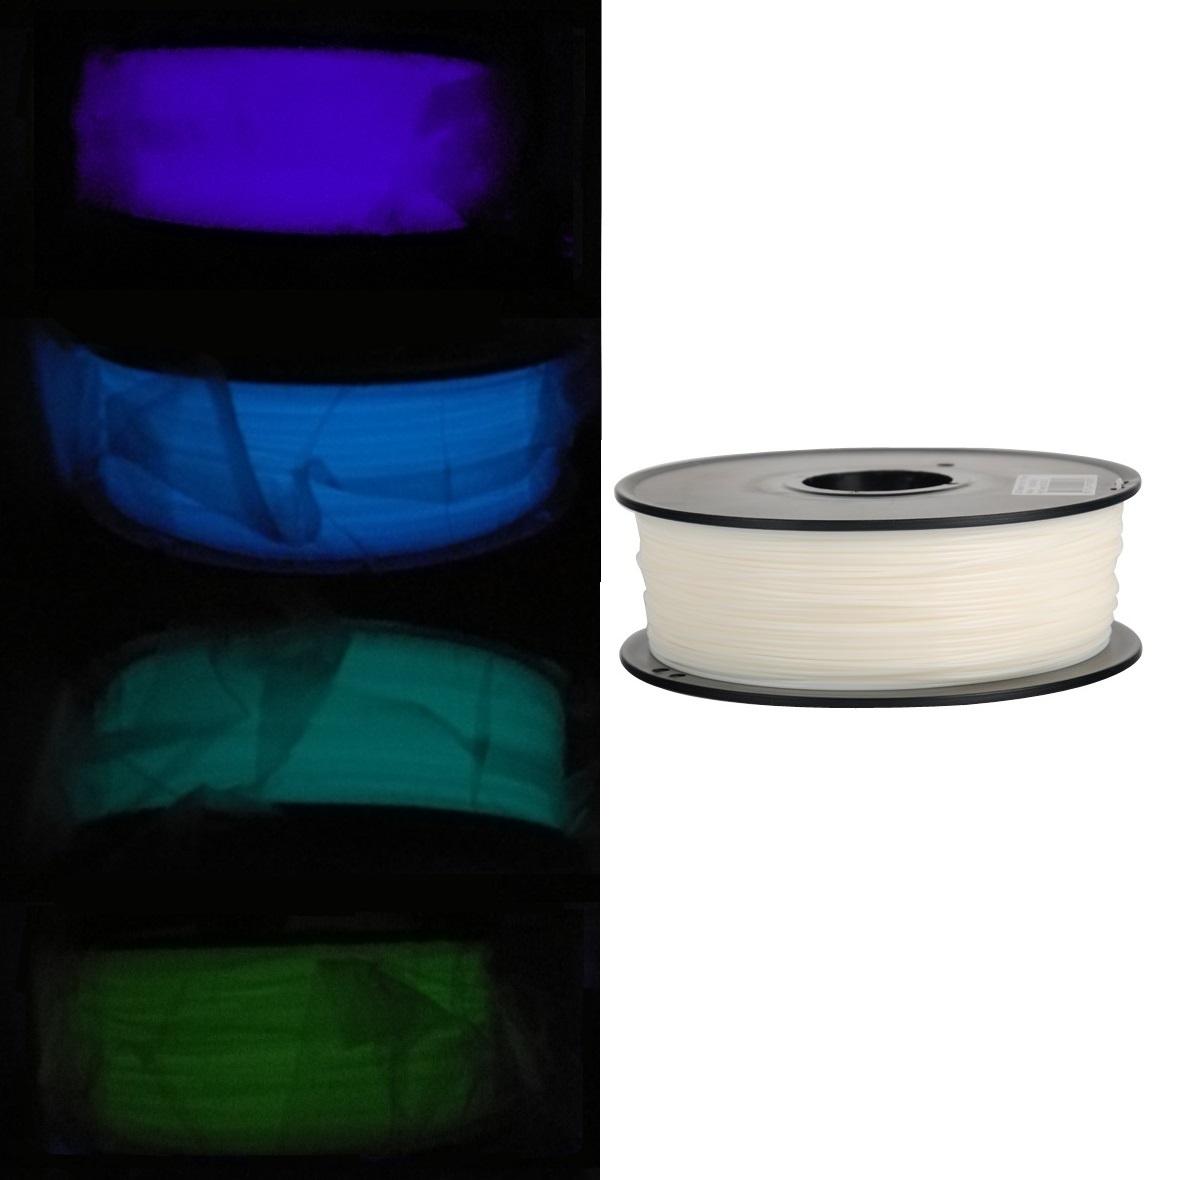 Selten 1kg Popular Brand Fluoreszierender Pla 3d Druck Filament 1.75mm 1000g Viele Farben!